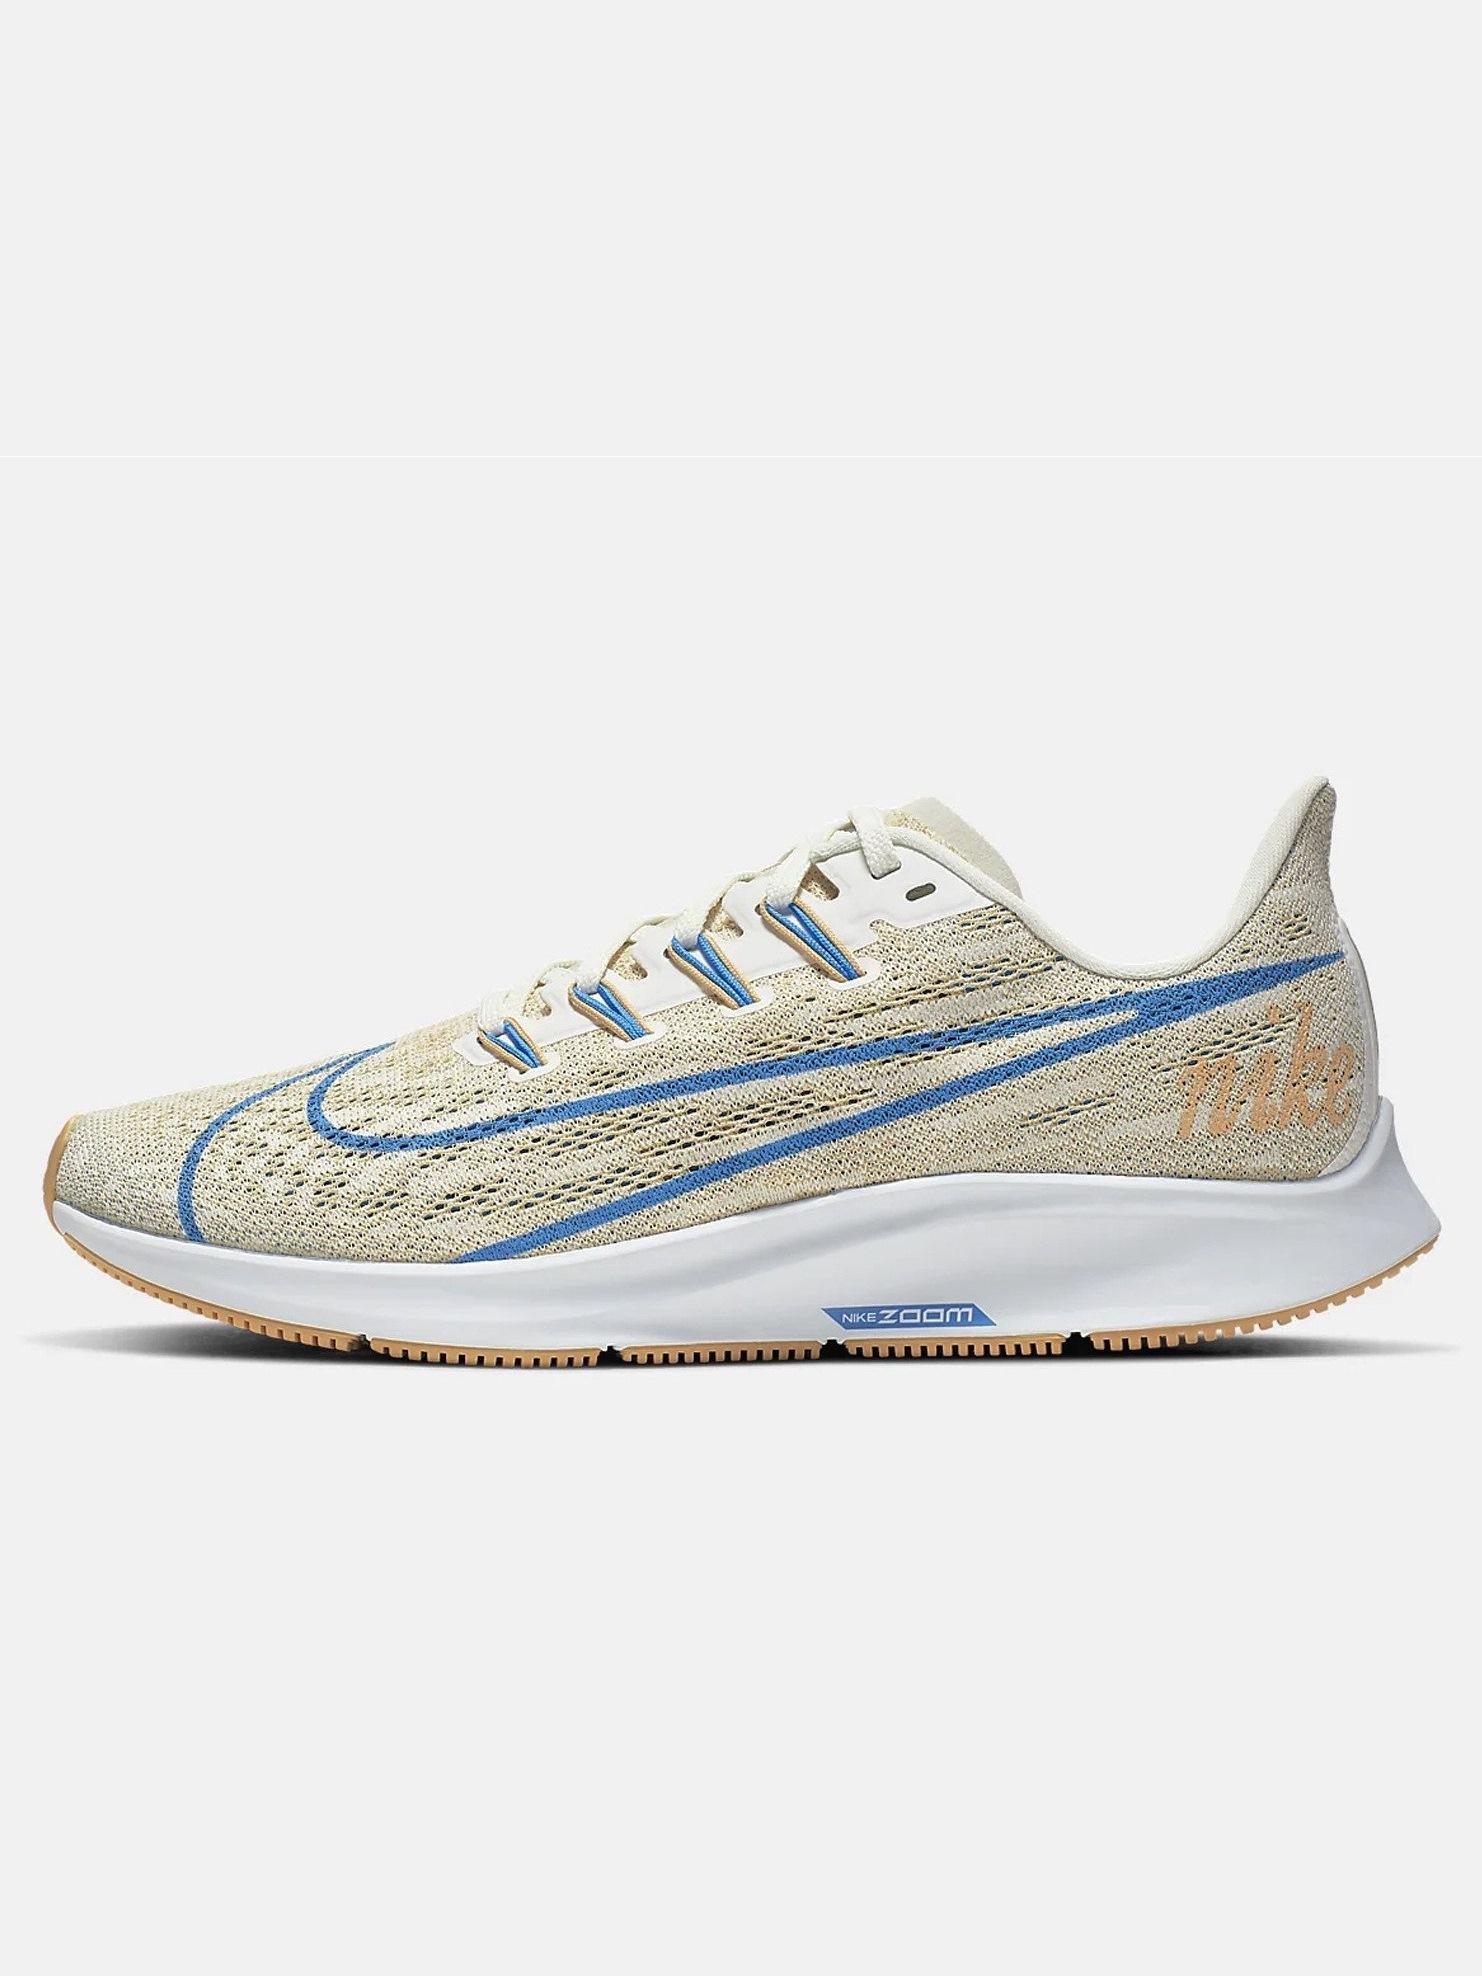 Кроссовки Running Air Zoom Pegasus 36 Nike 0193145349 36 Бежевый Free Style